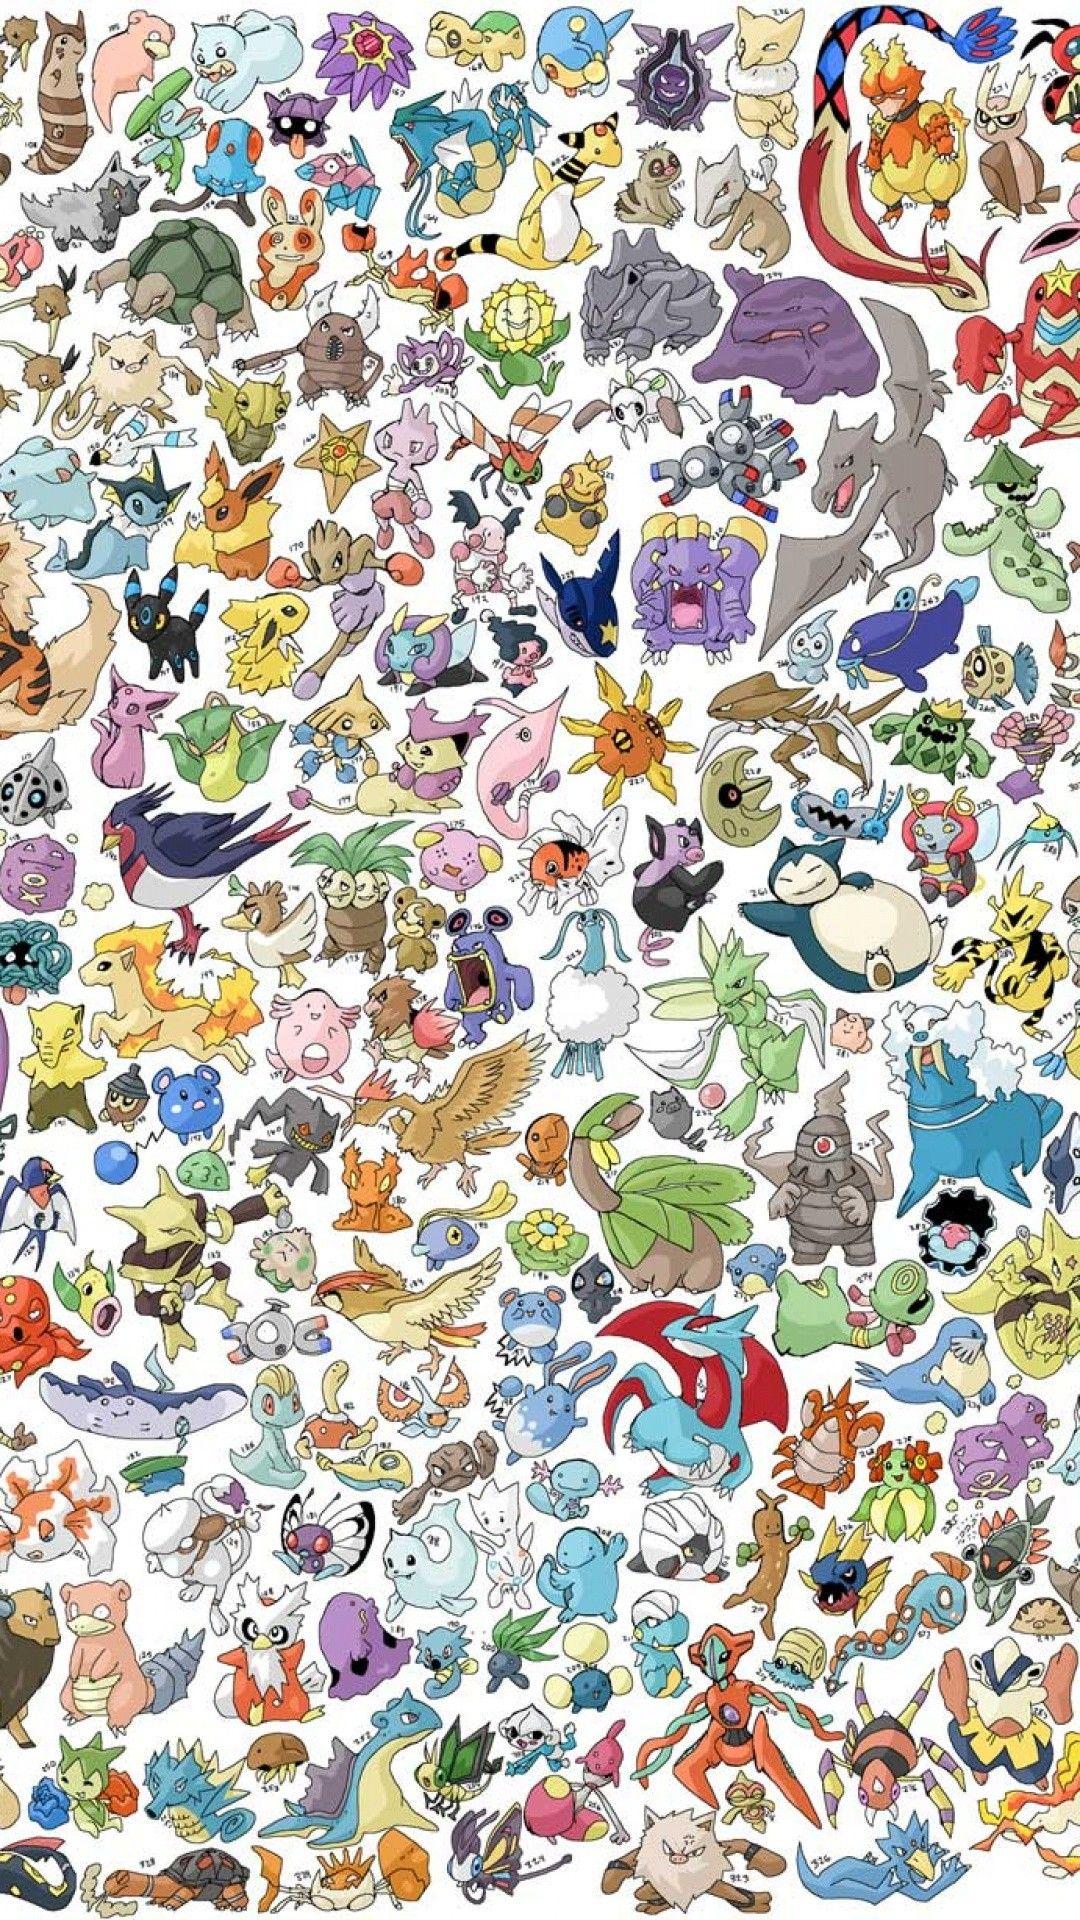 Free Download Pokemon iPhone Wallpaper. Pokemon